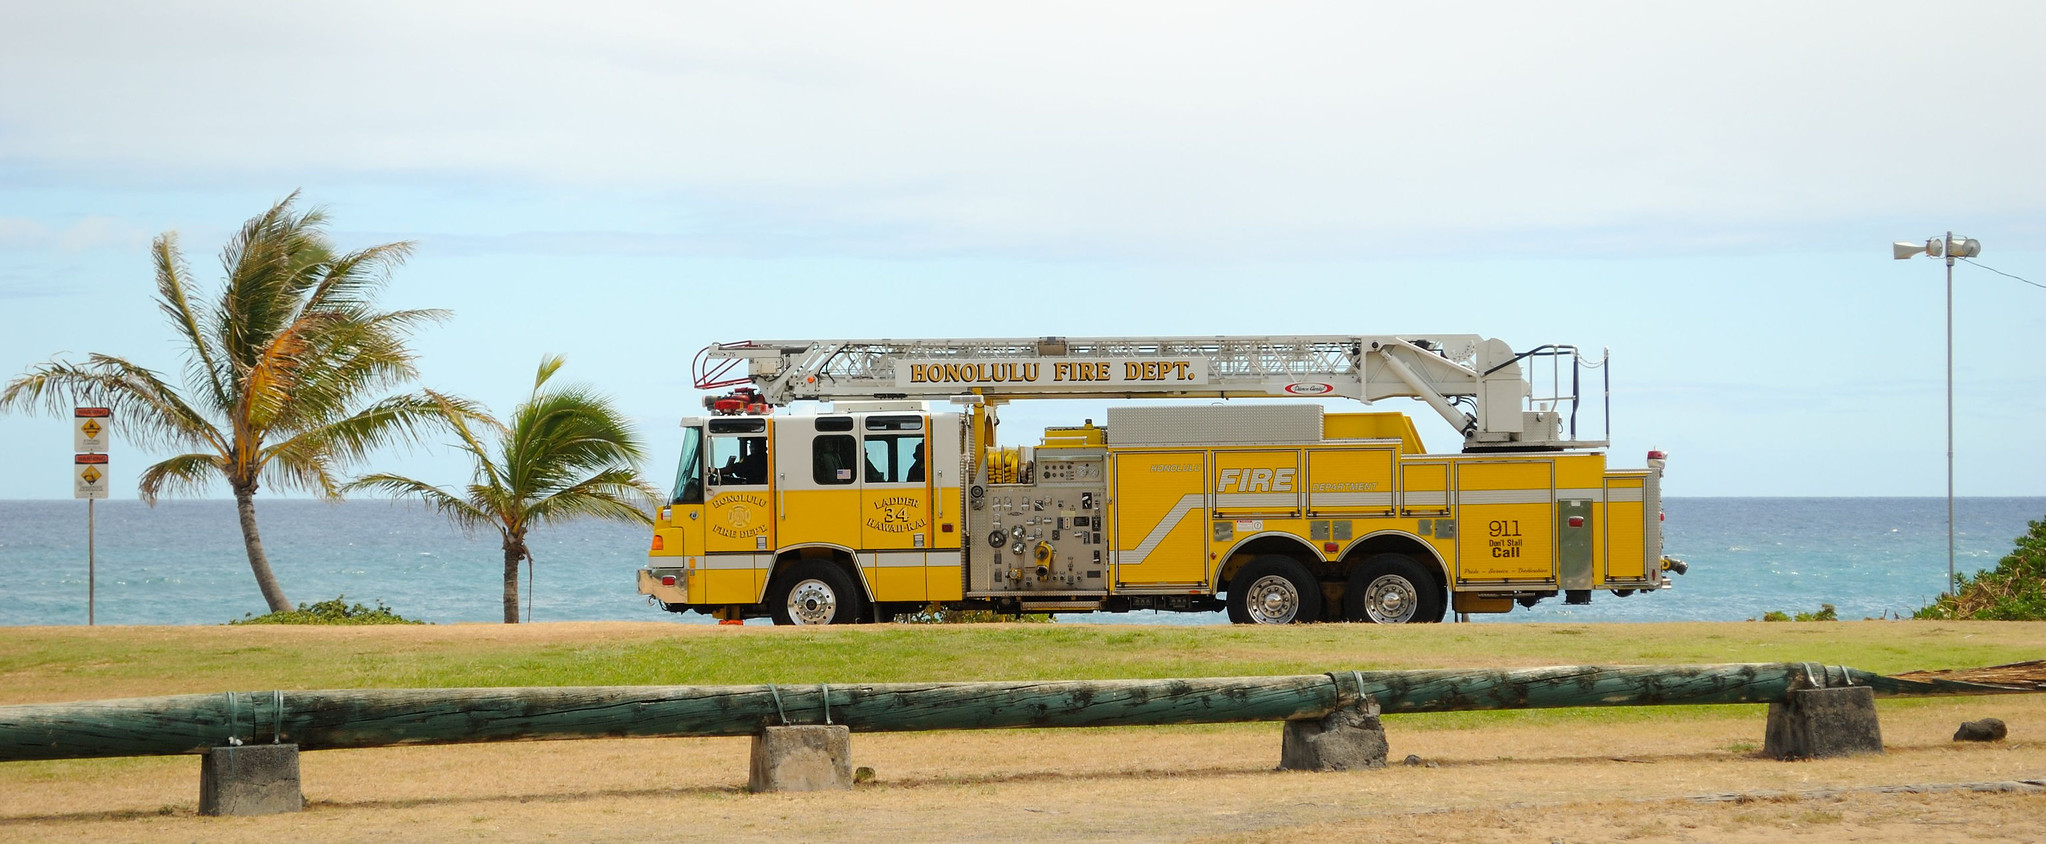 Kapolei Fire Station